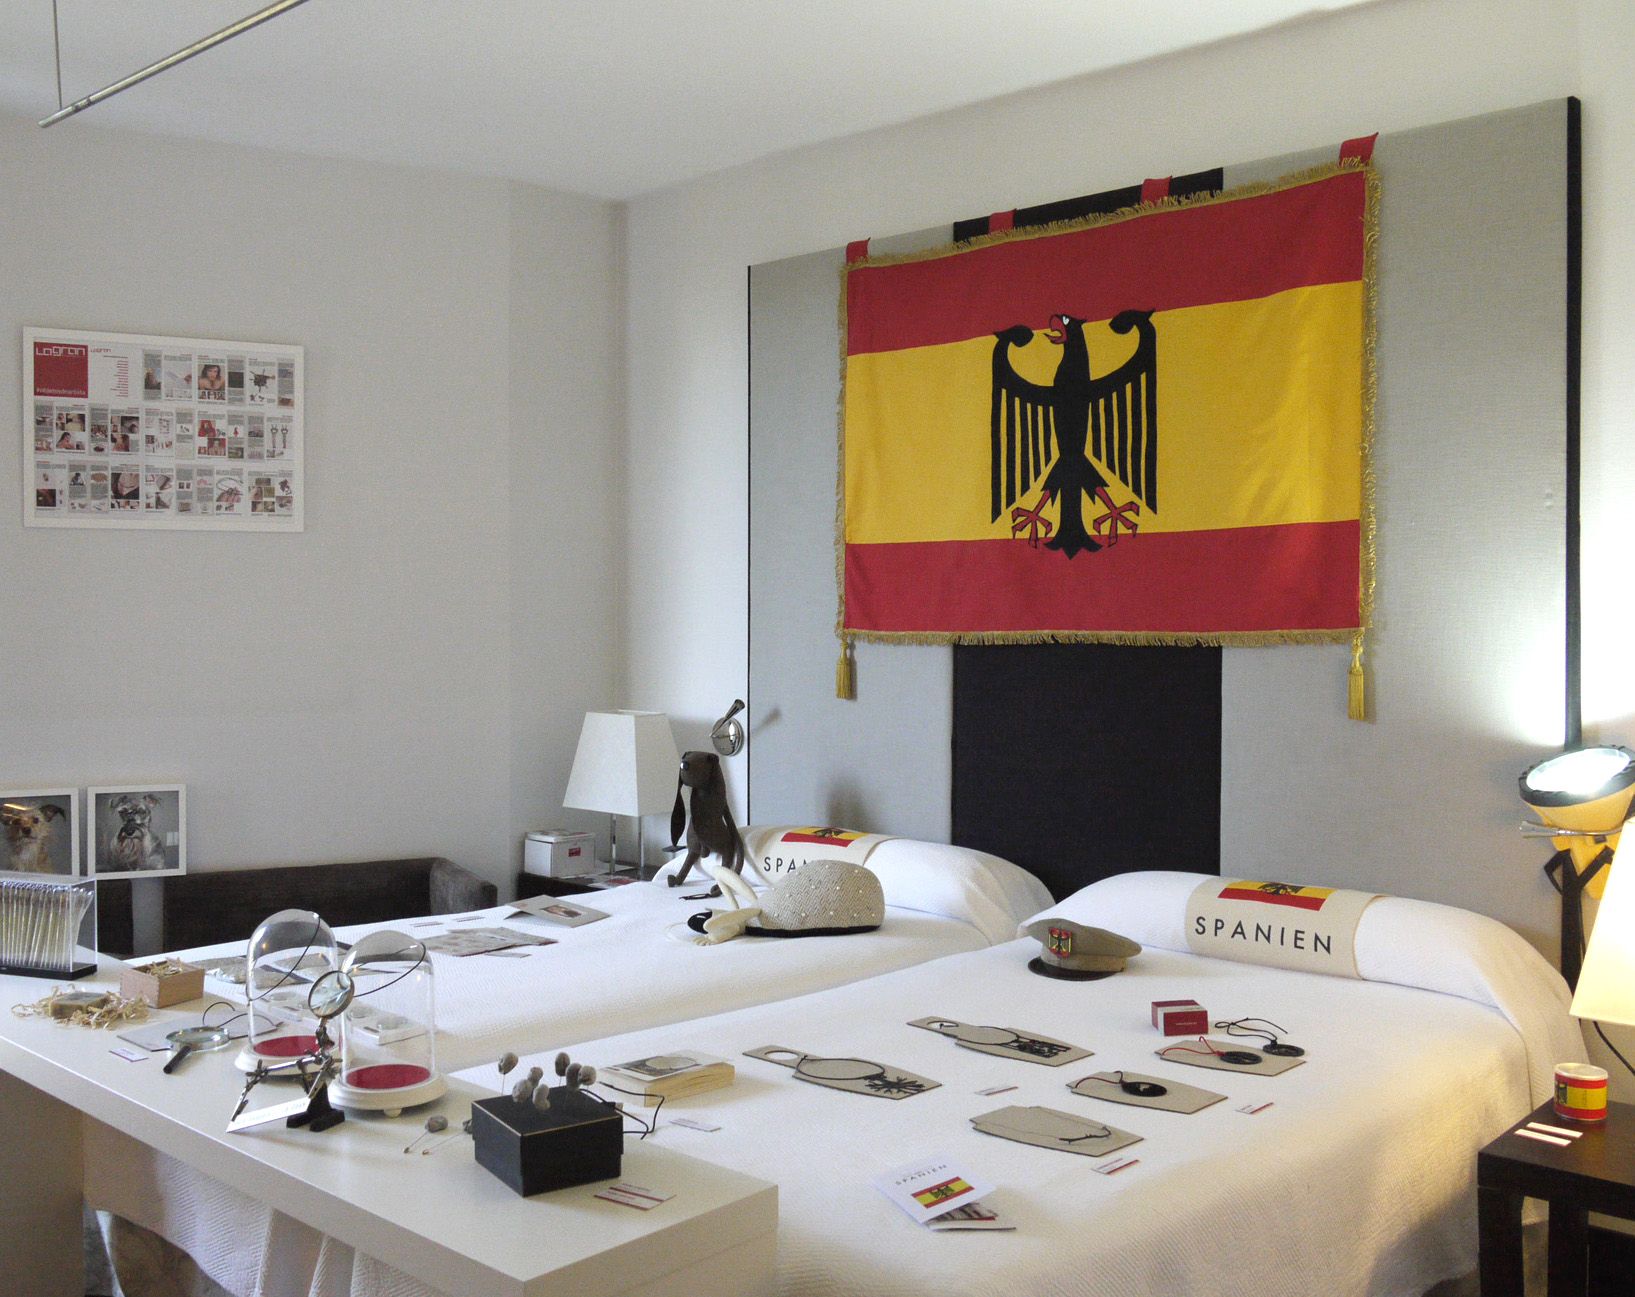 habitacion-marca-spanien.jpg